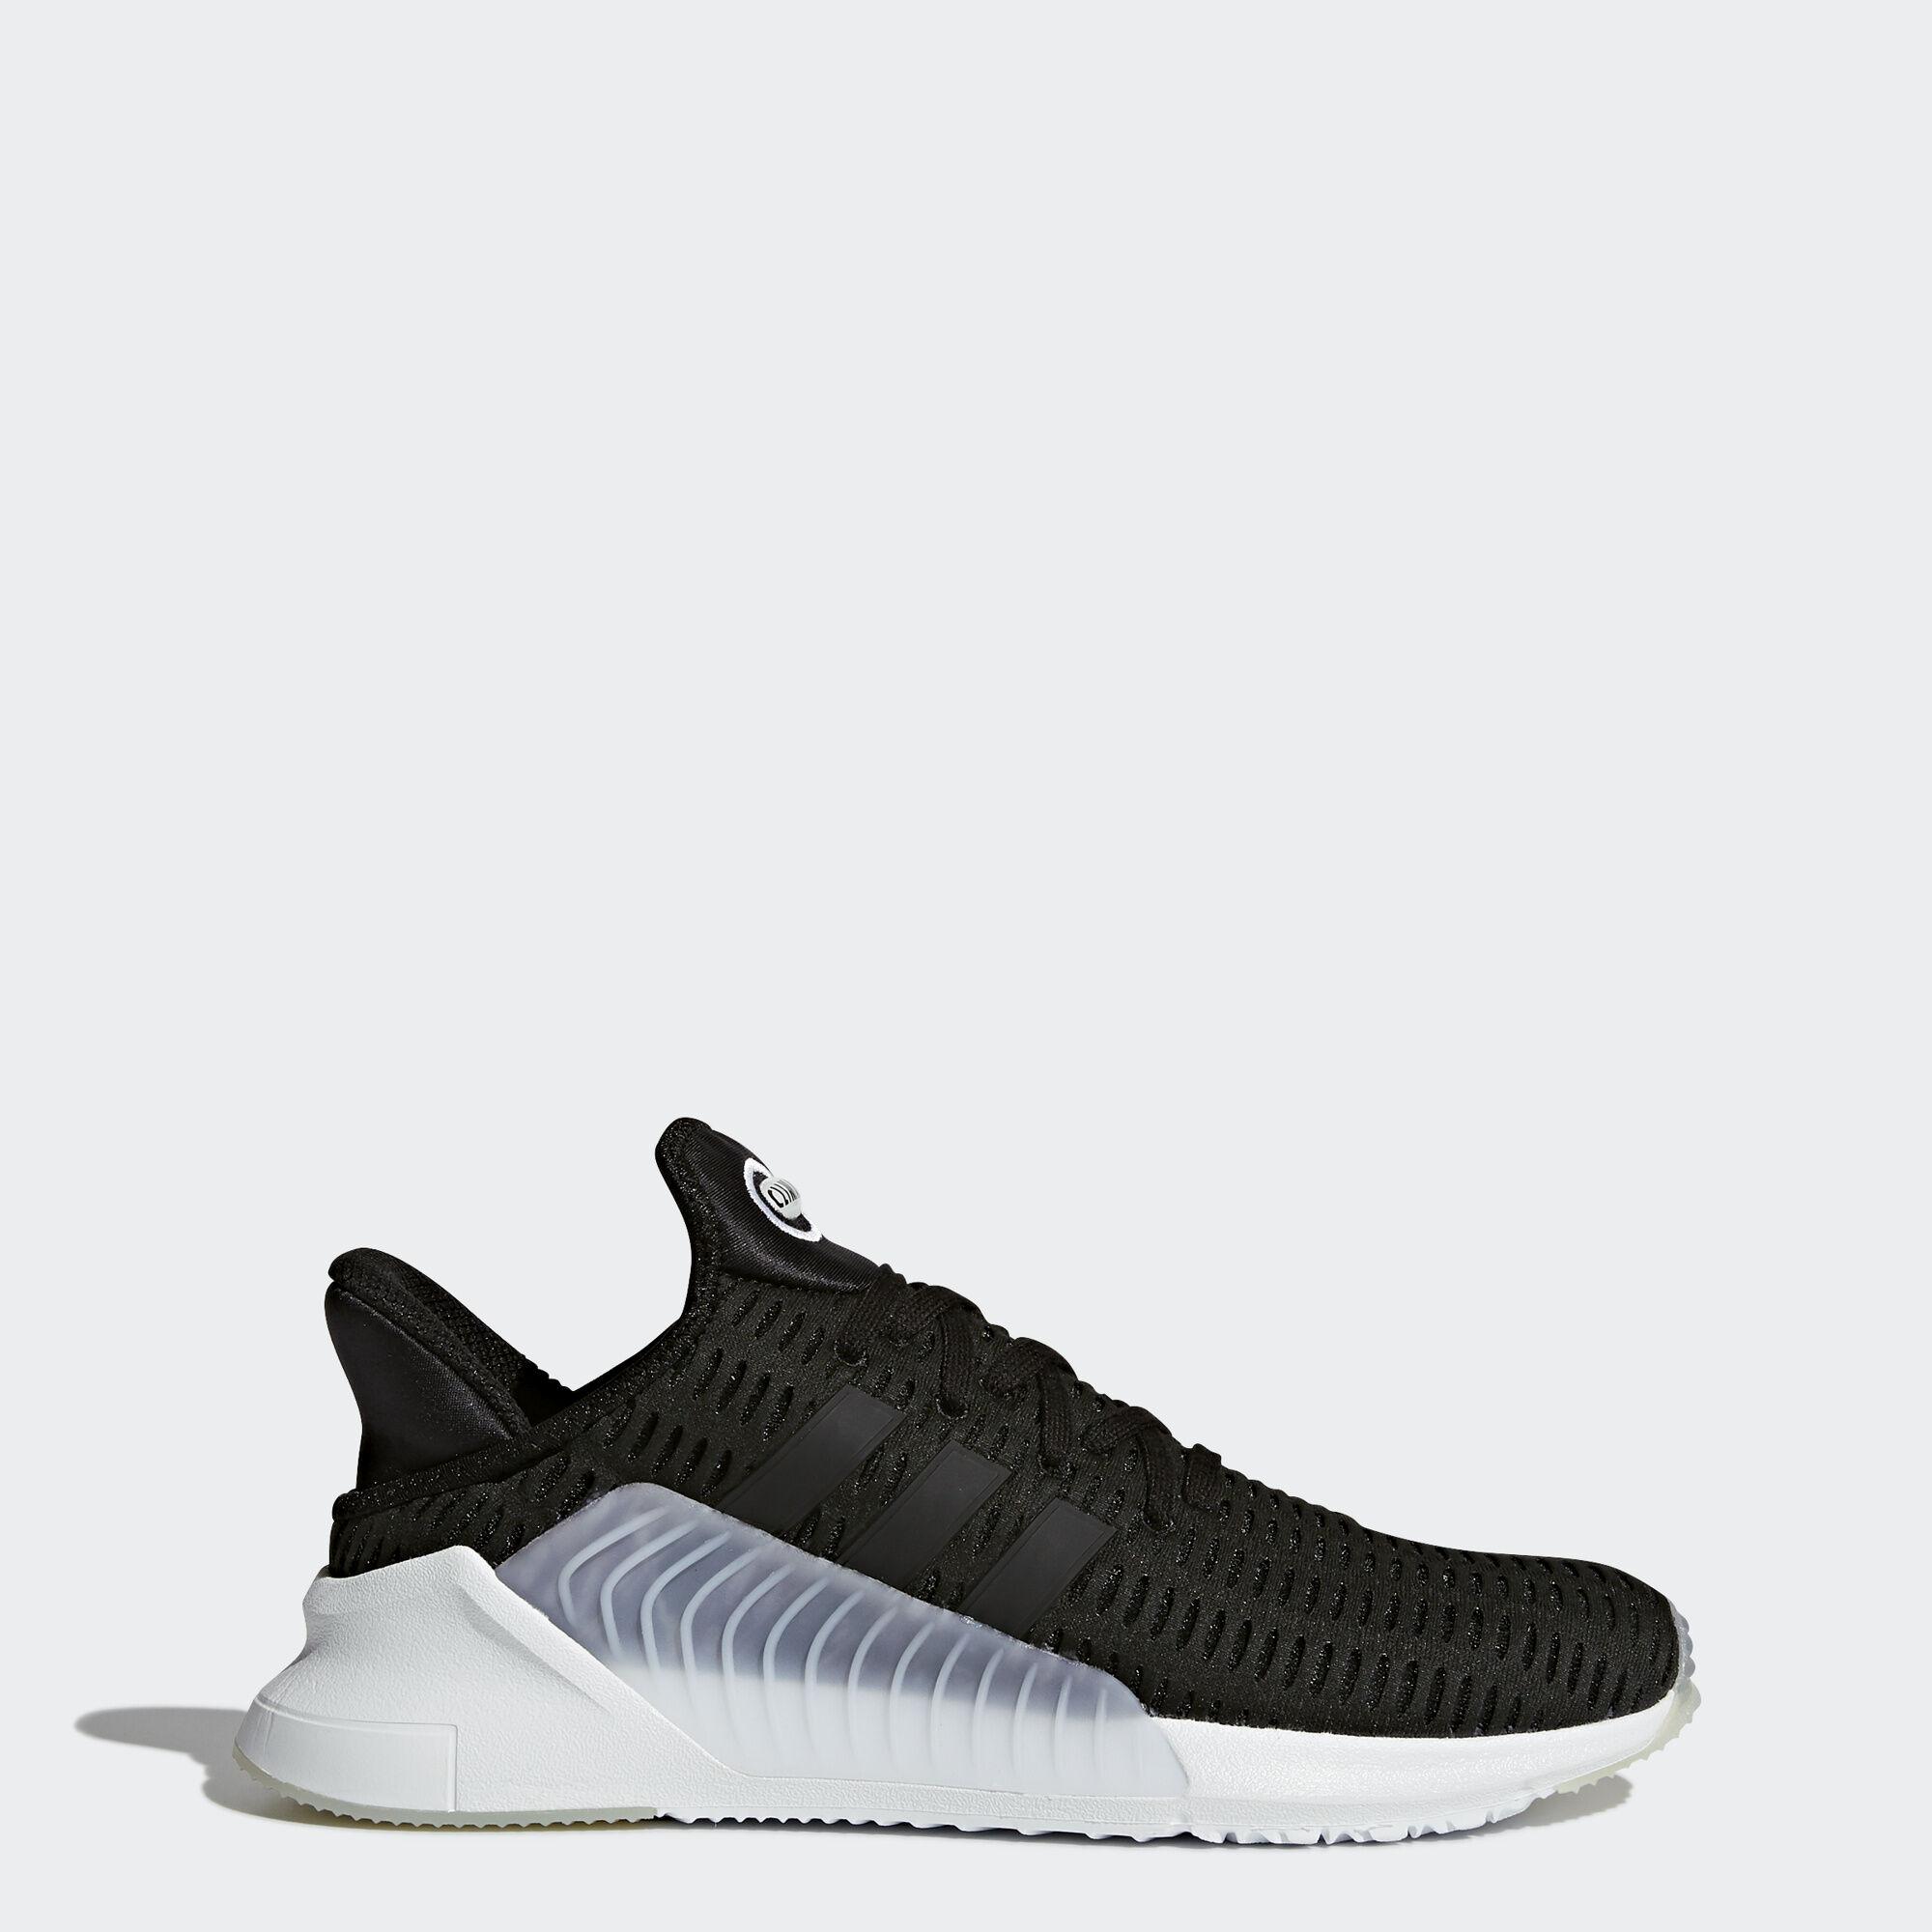 Adidas climacool zwart